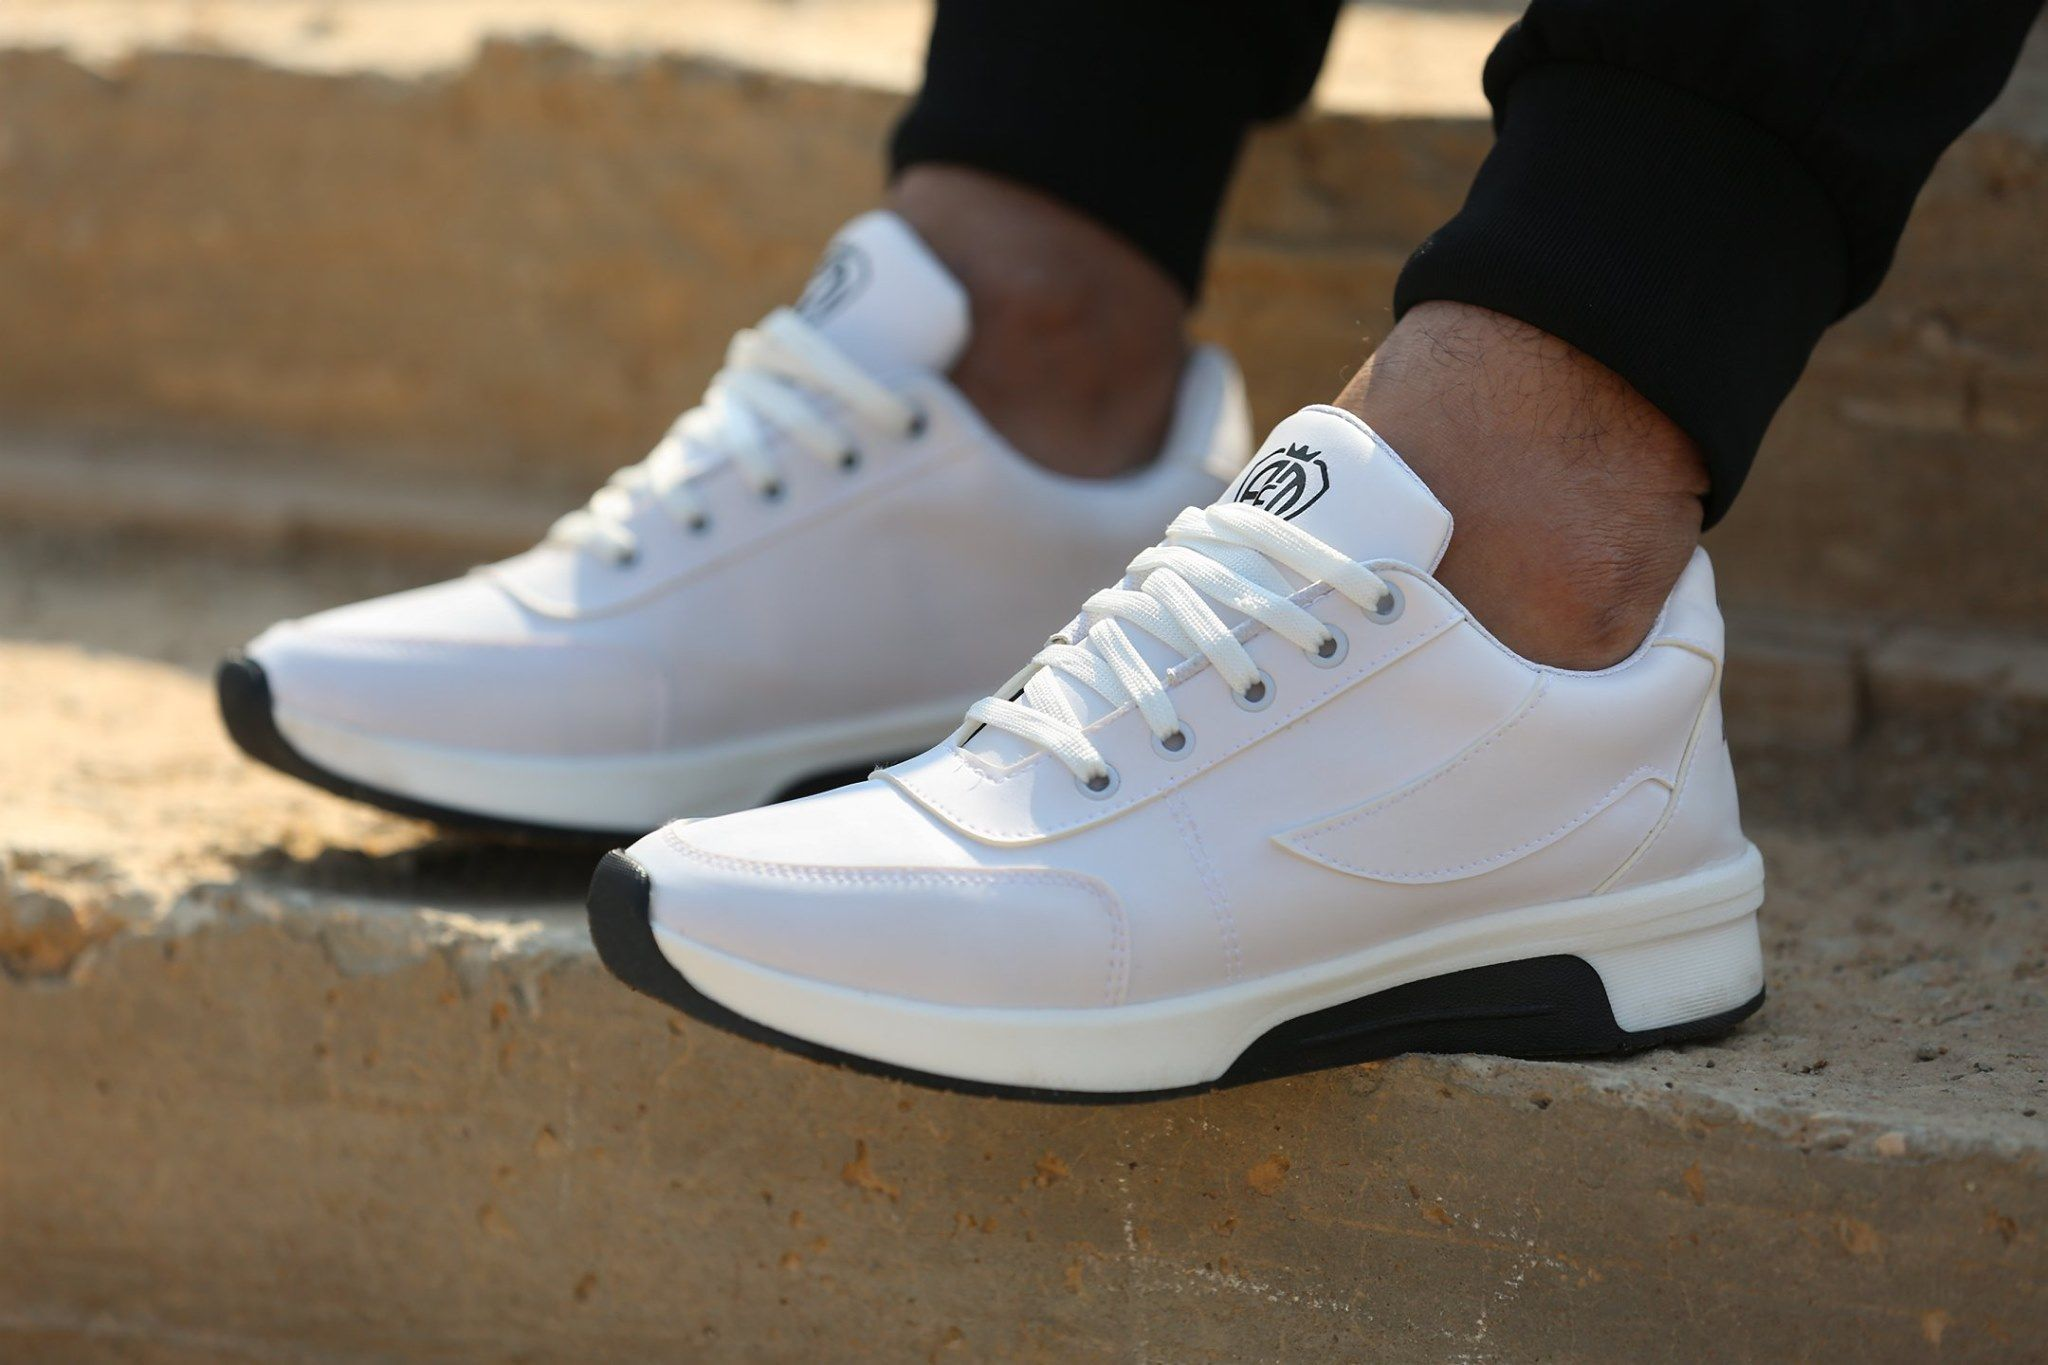 حذاء Amformen اوريجنال اصلي بمميزات الـ1x10 Shoe Brands Things To Sell Air Jordans